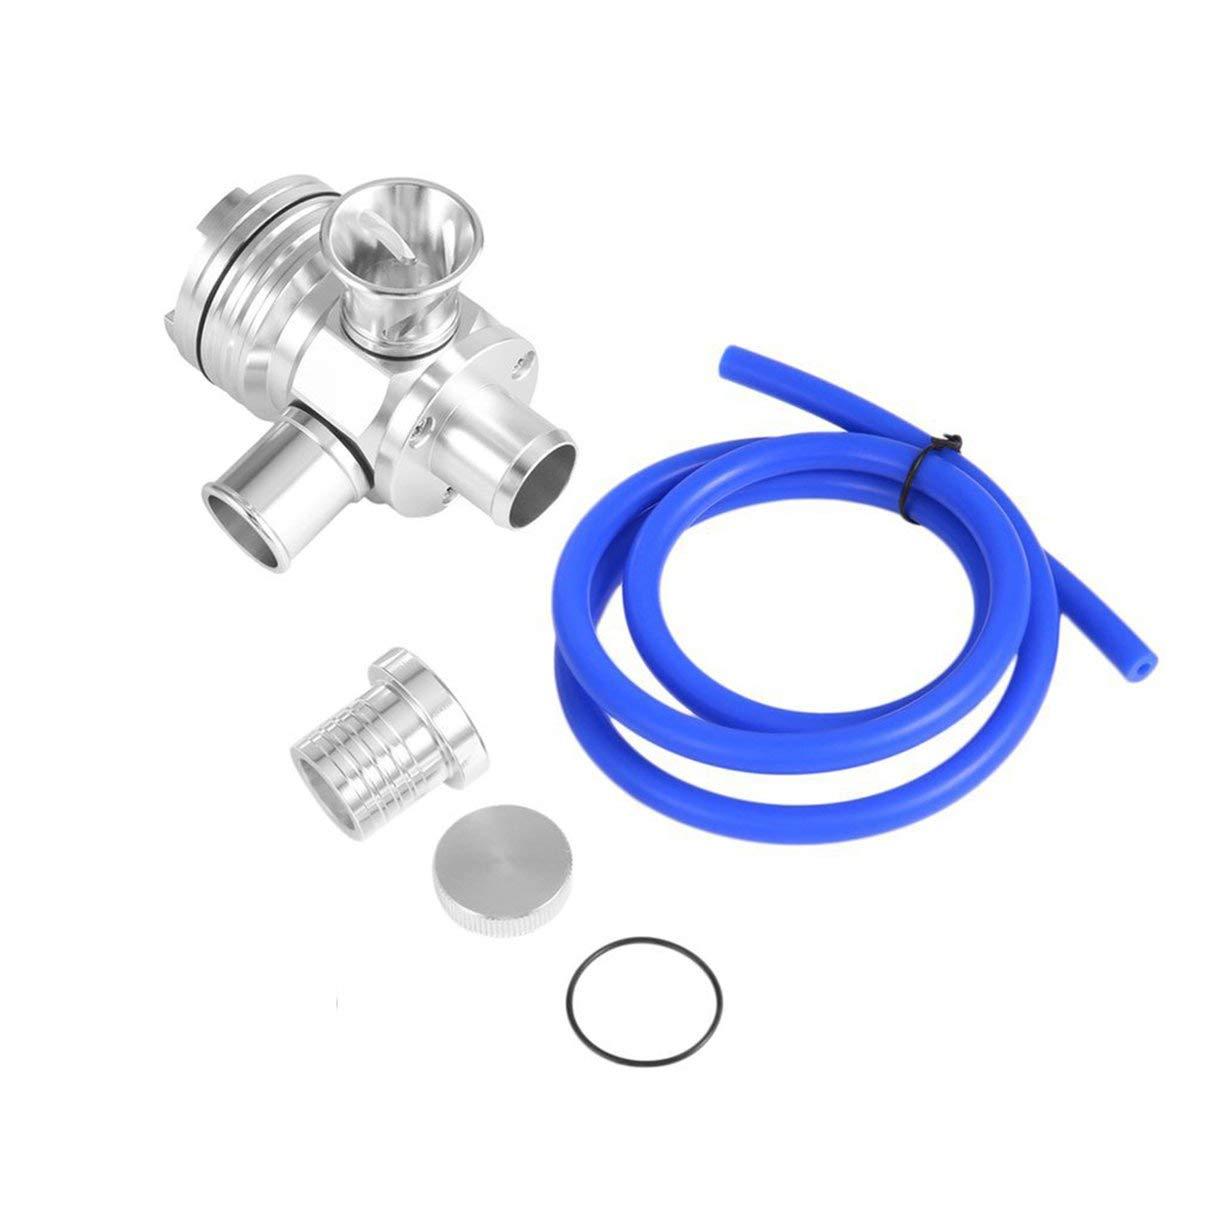 Vá lvula de descarga de la vá lvula de alivio de presió n de descarga de presió n de Turbo Boost de Turbo Boost para VW para Audi 1.8T 2.7T Partes de accesorios de automó viles JullyeleESgant